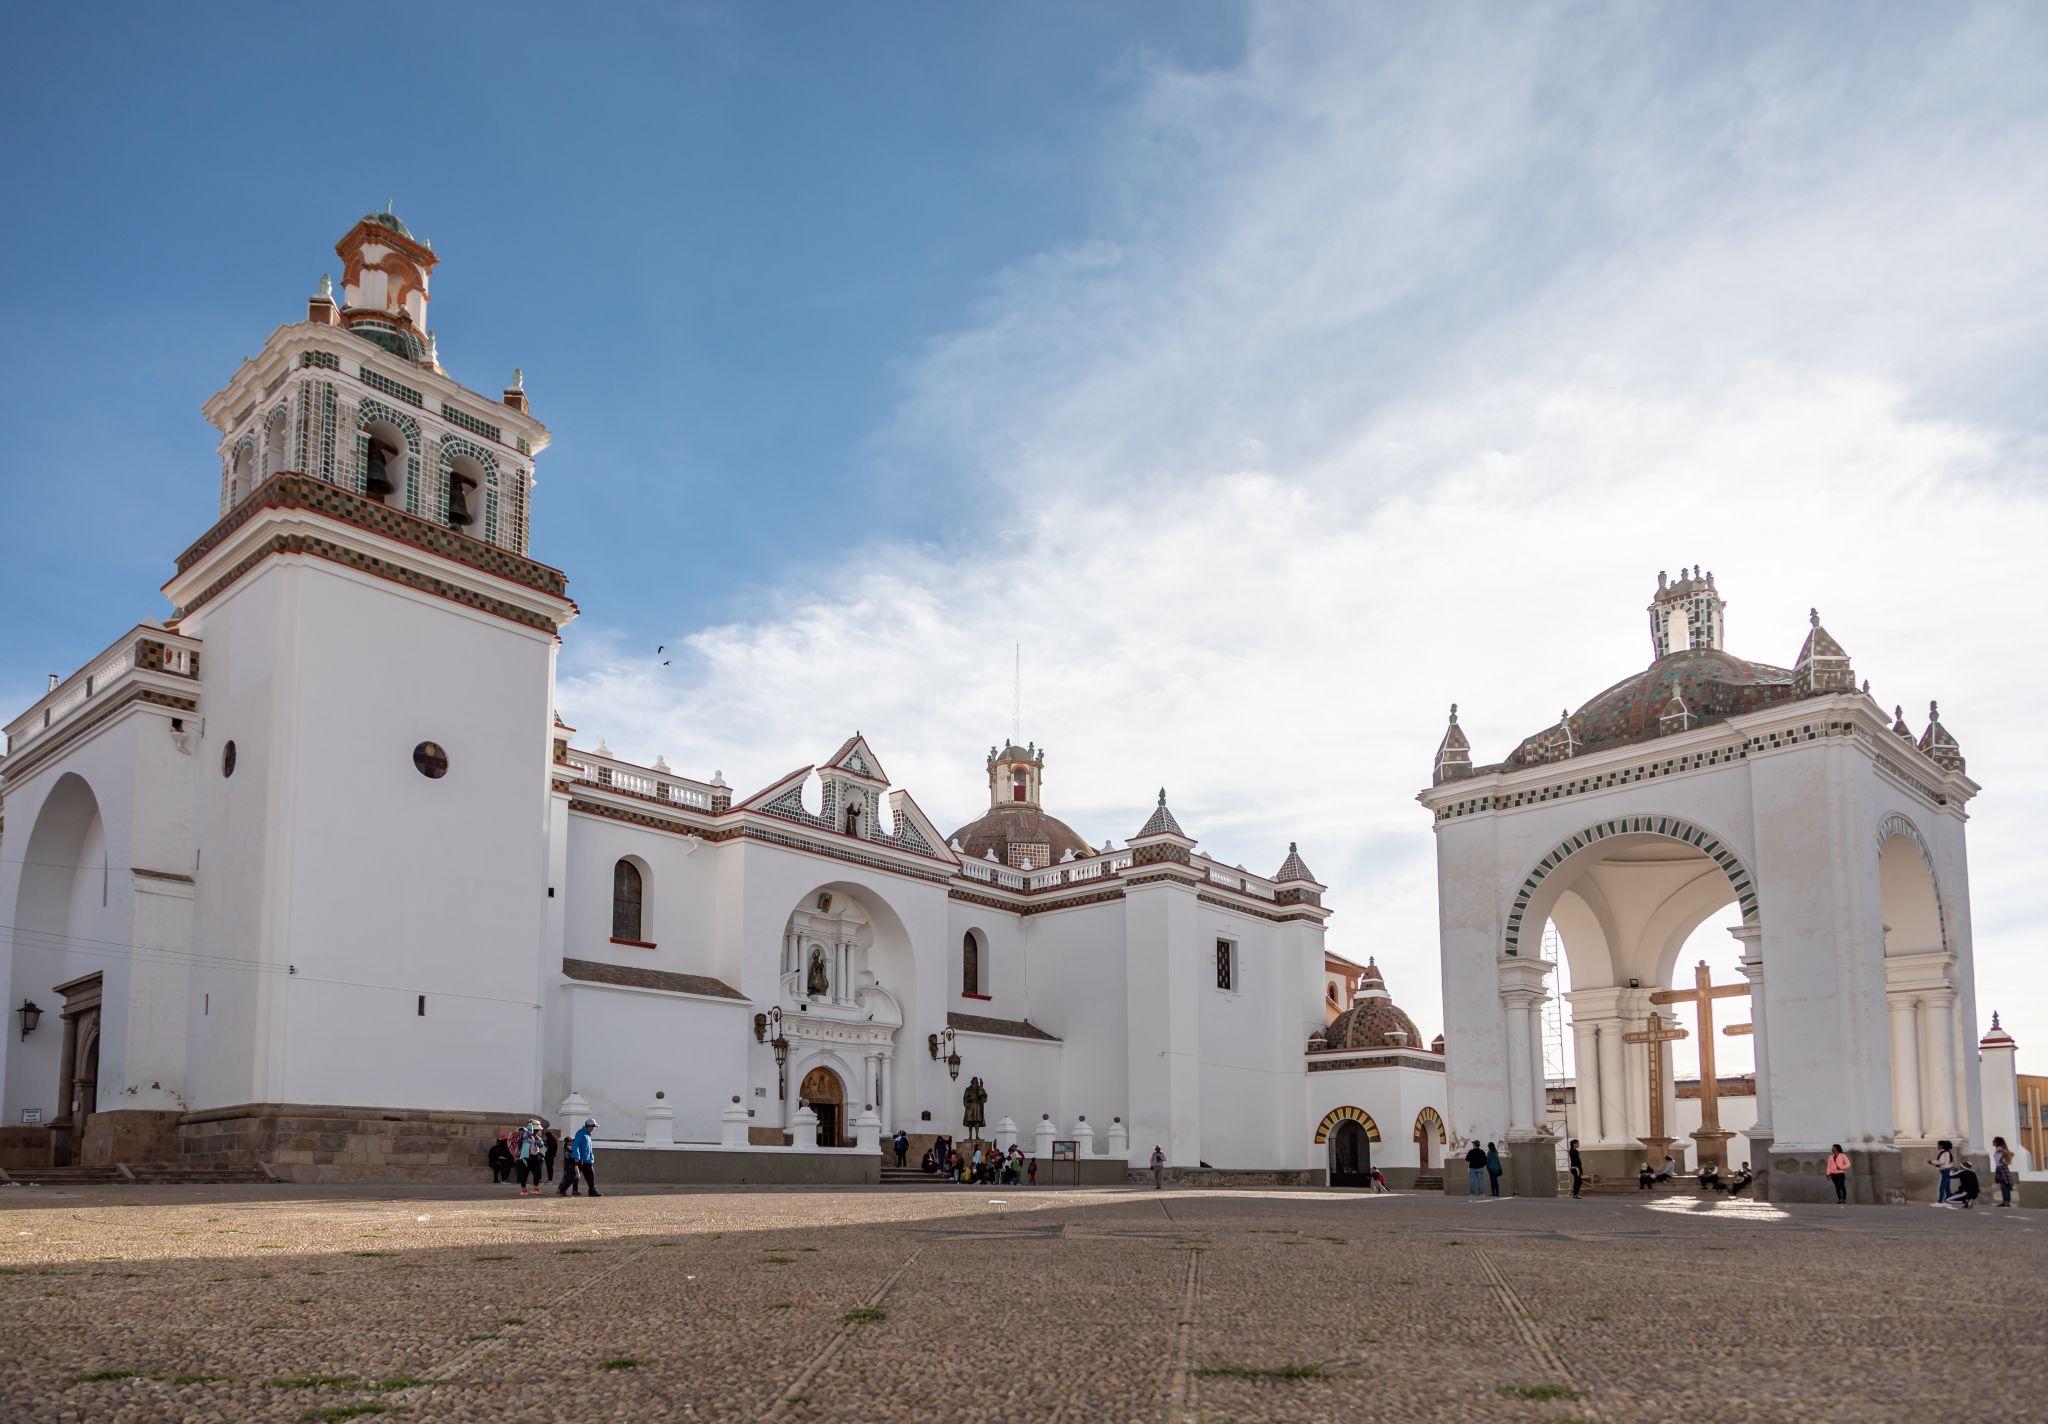 Basilica de Nuestra Senora de Copacabana, Bolivia